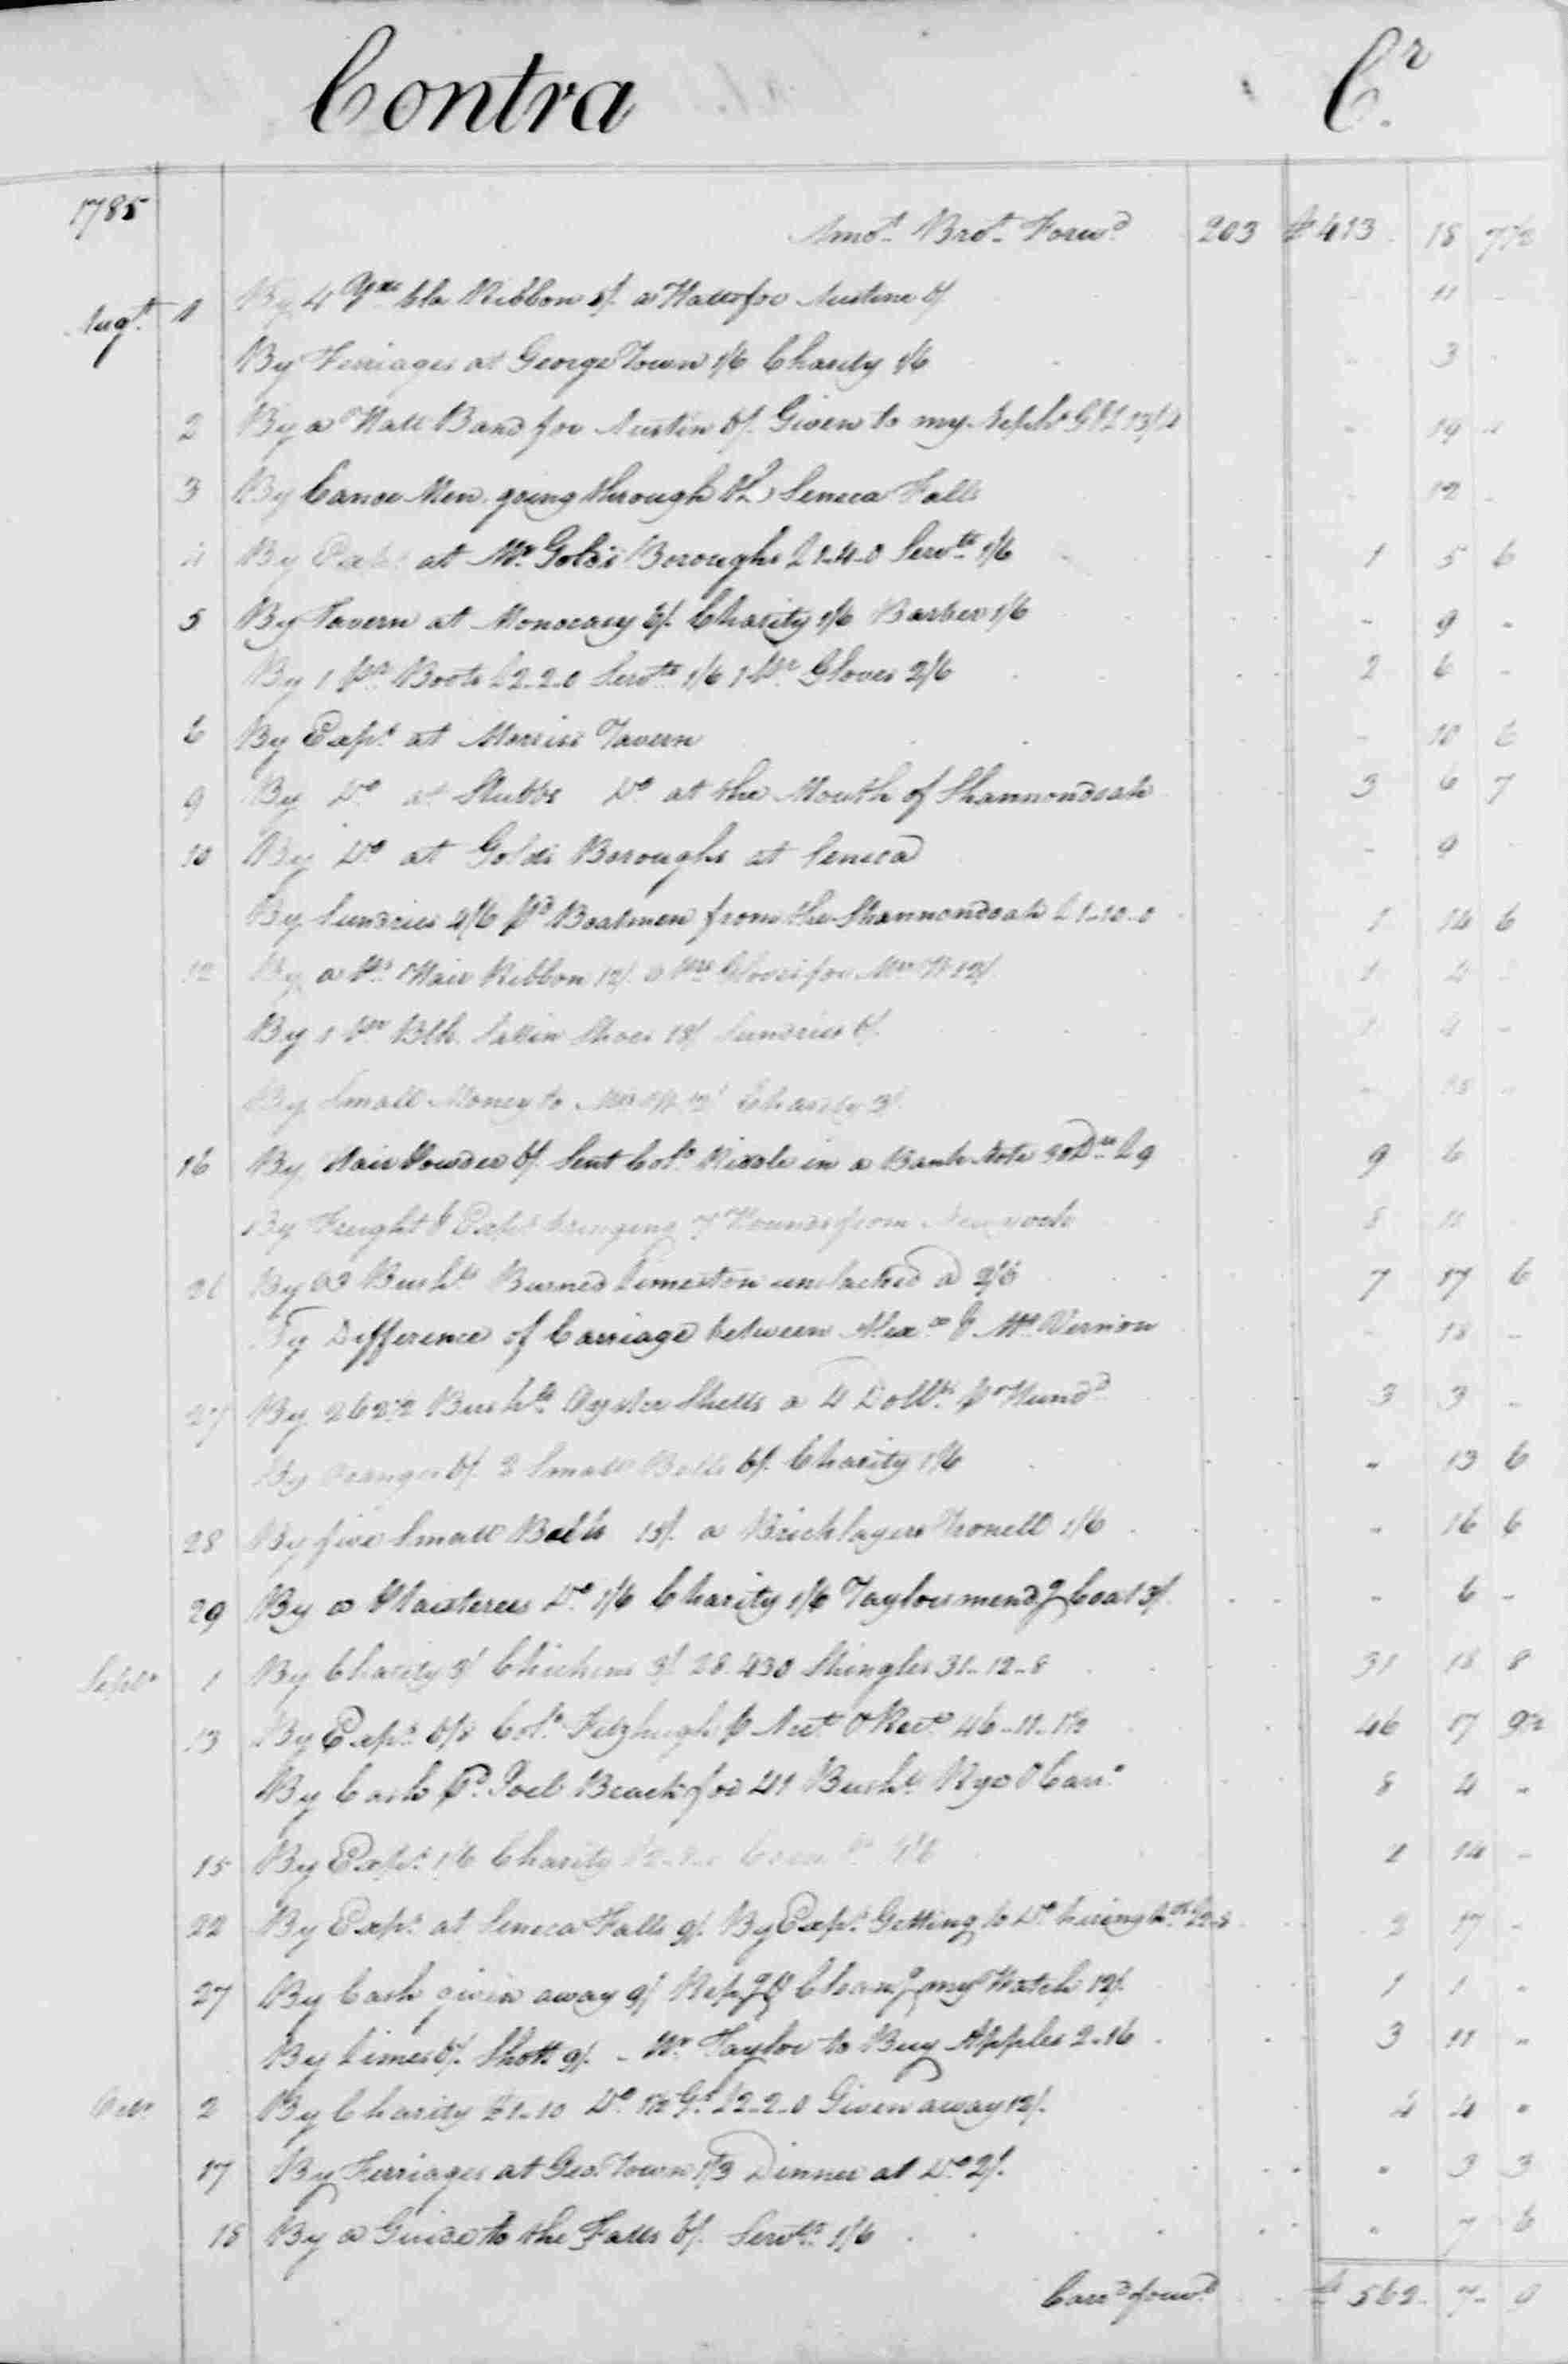 Ledger B, folio 204, right side